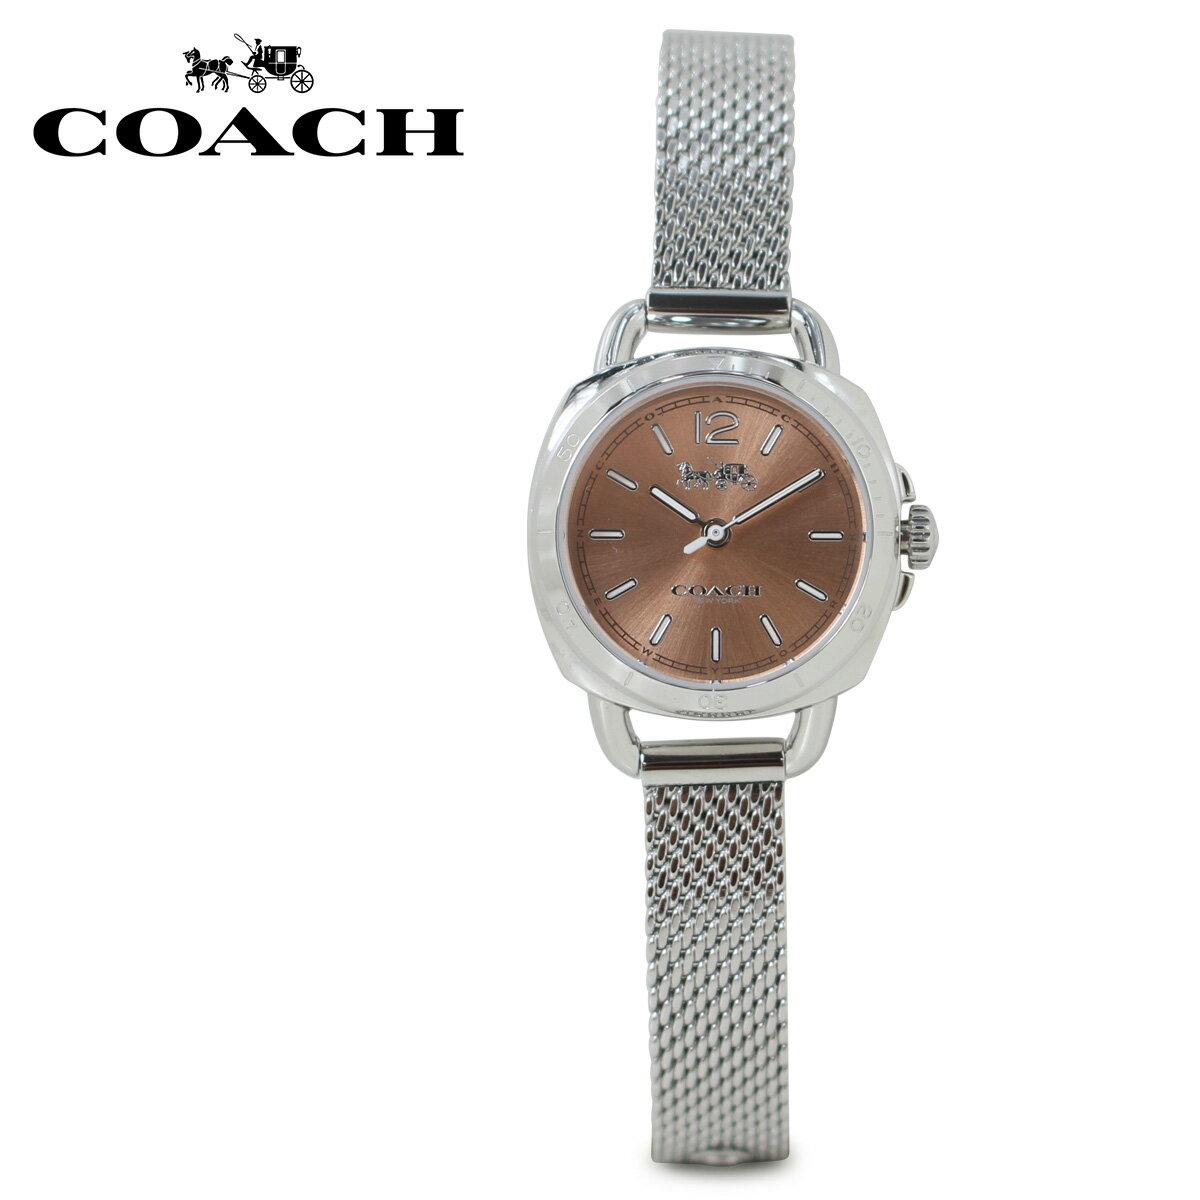 COACH 14502631 コーチ 腕時計 レディース シルバー [5/22 新入荷]